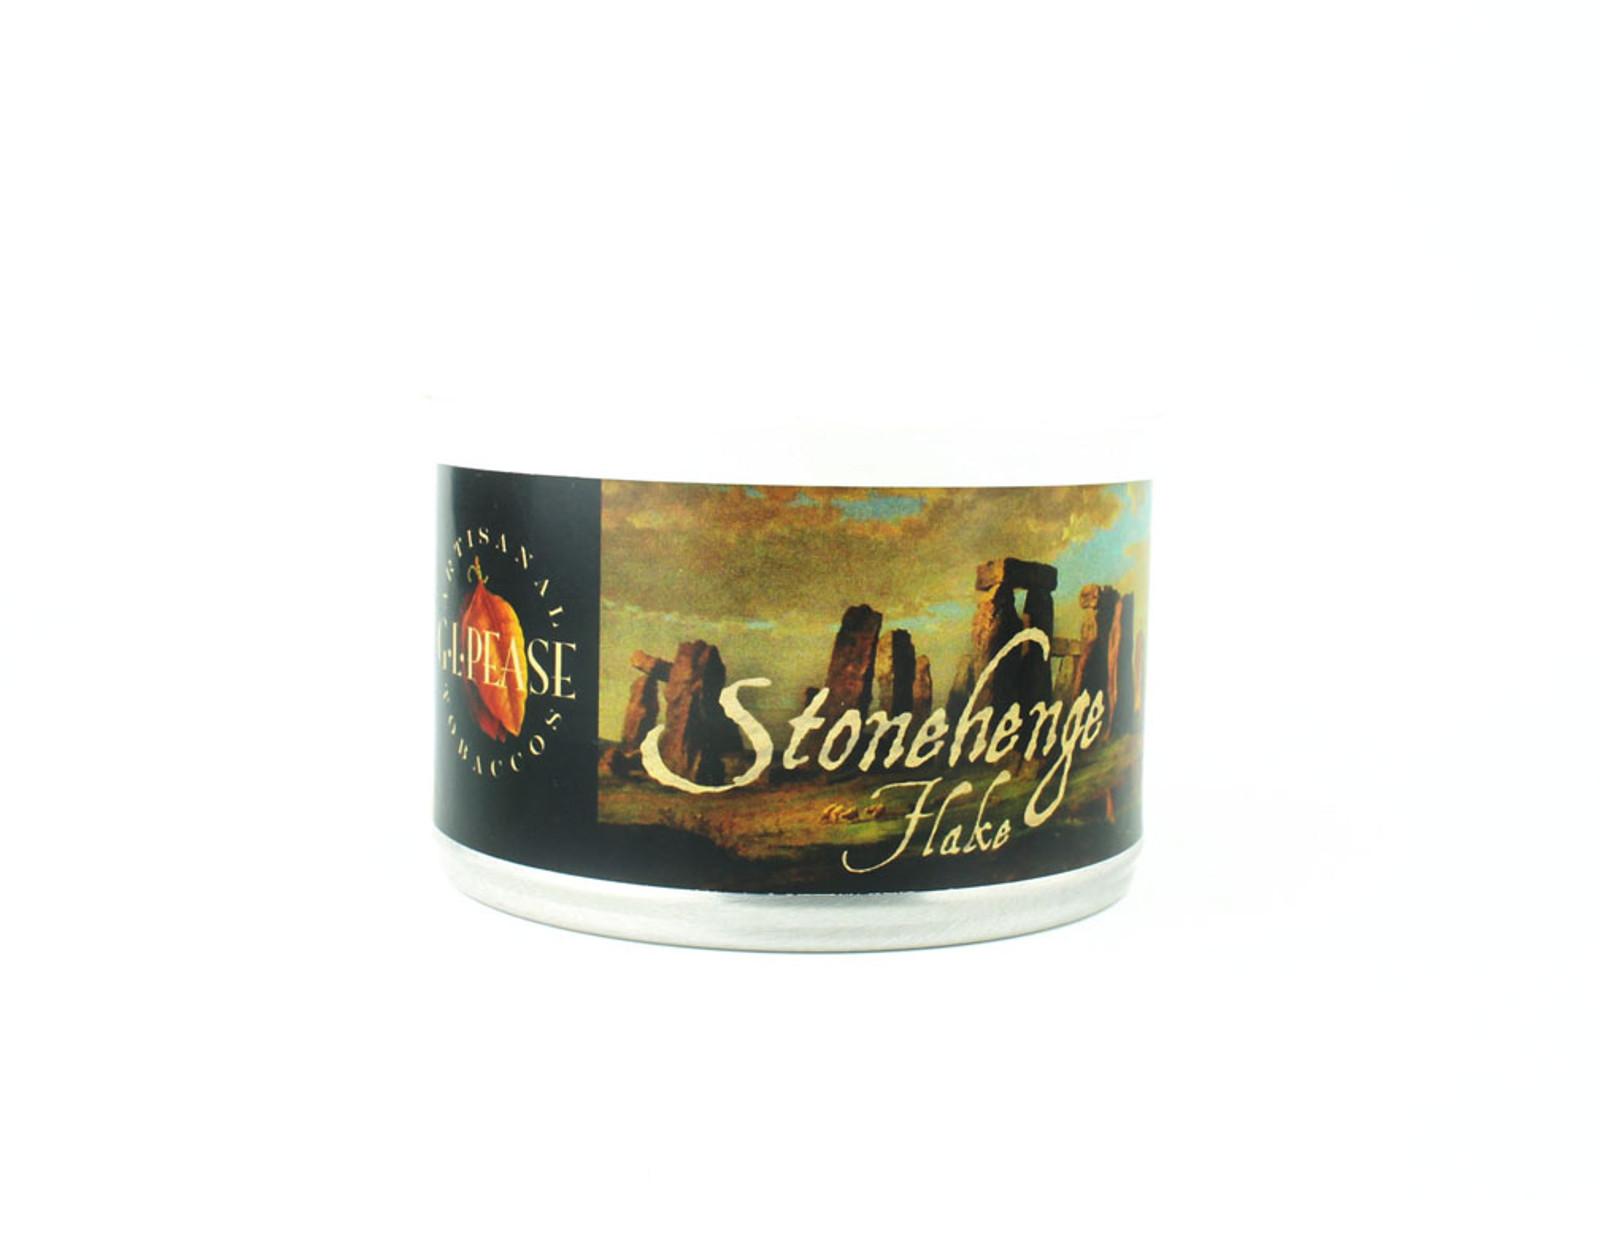 G.L. Pease Stonehenge Flake - 2 oz tin